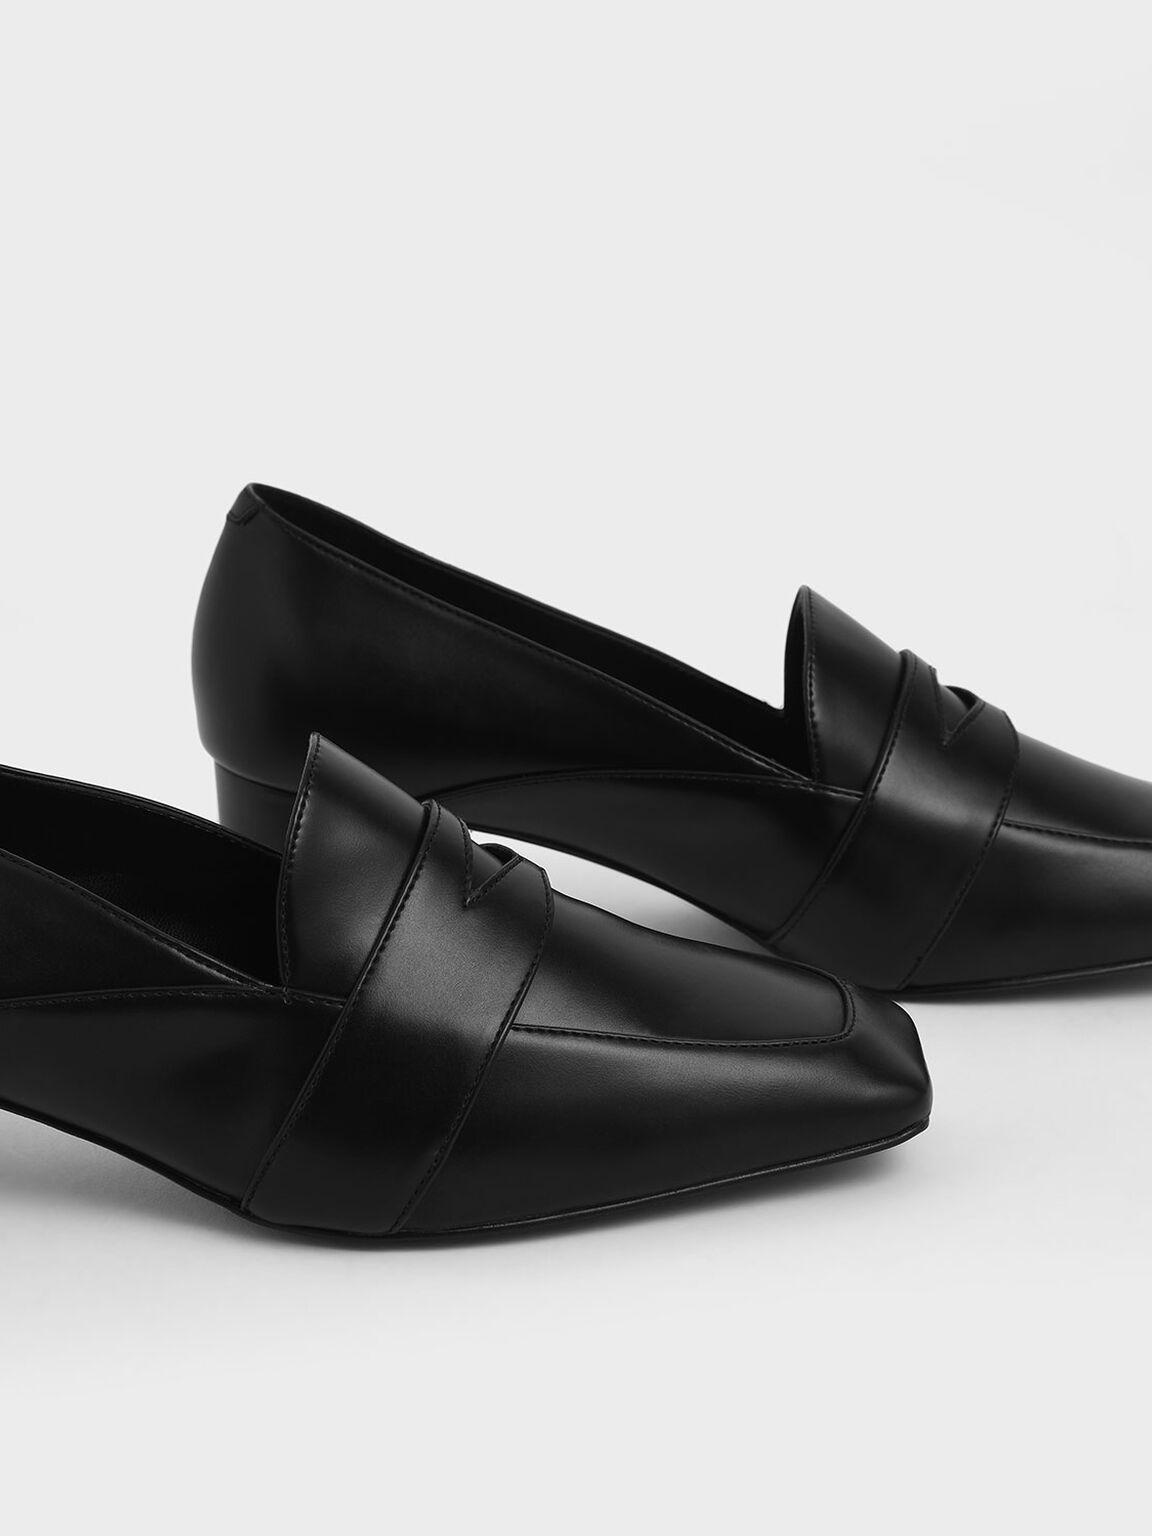 Square Toe Block Heel Loafers, Black, hi-res